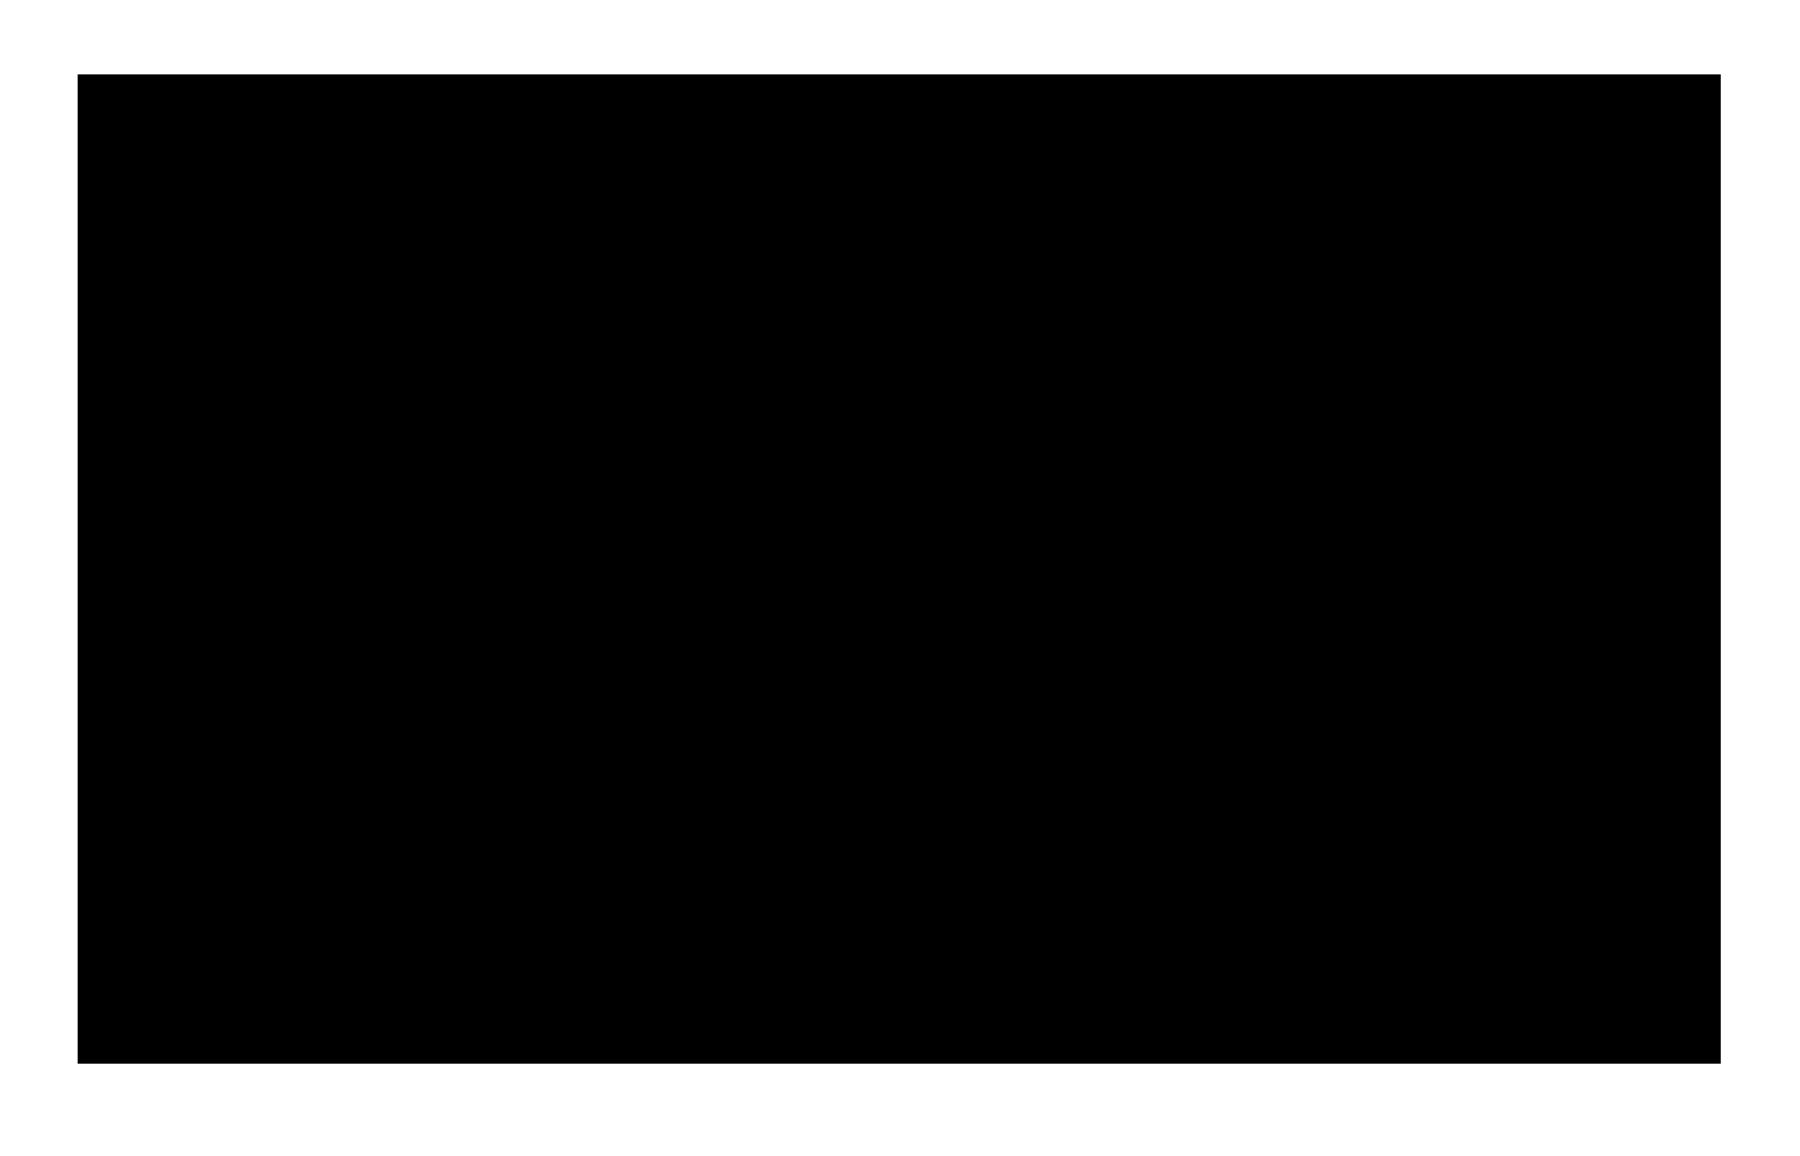 p11-trans-1